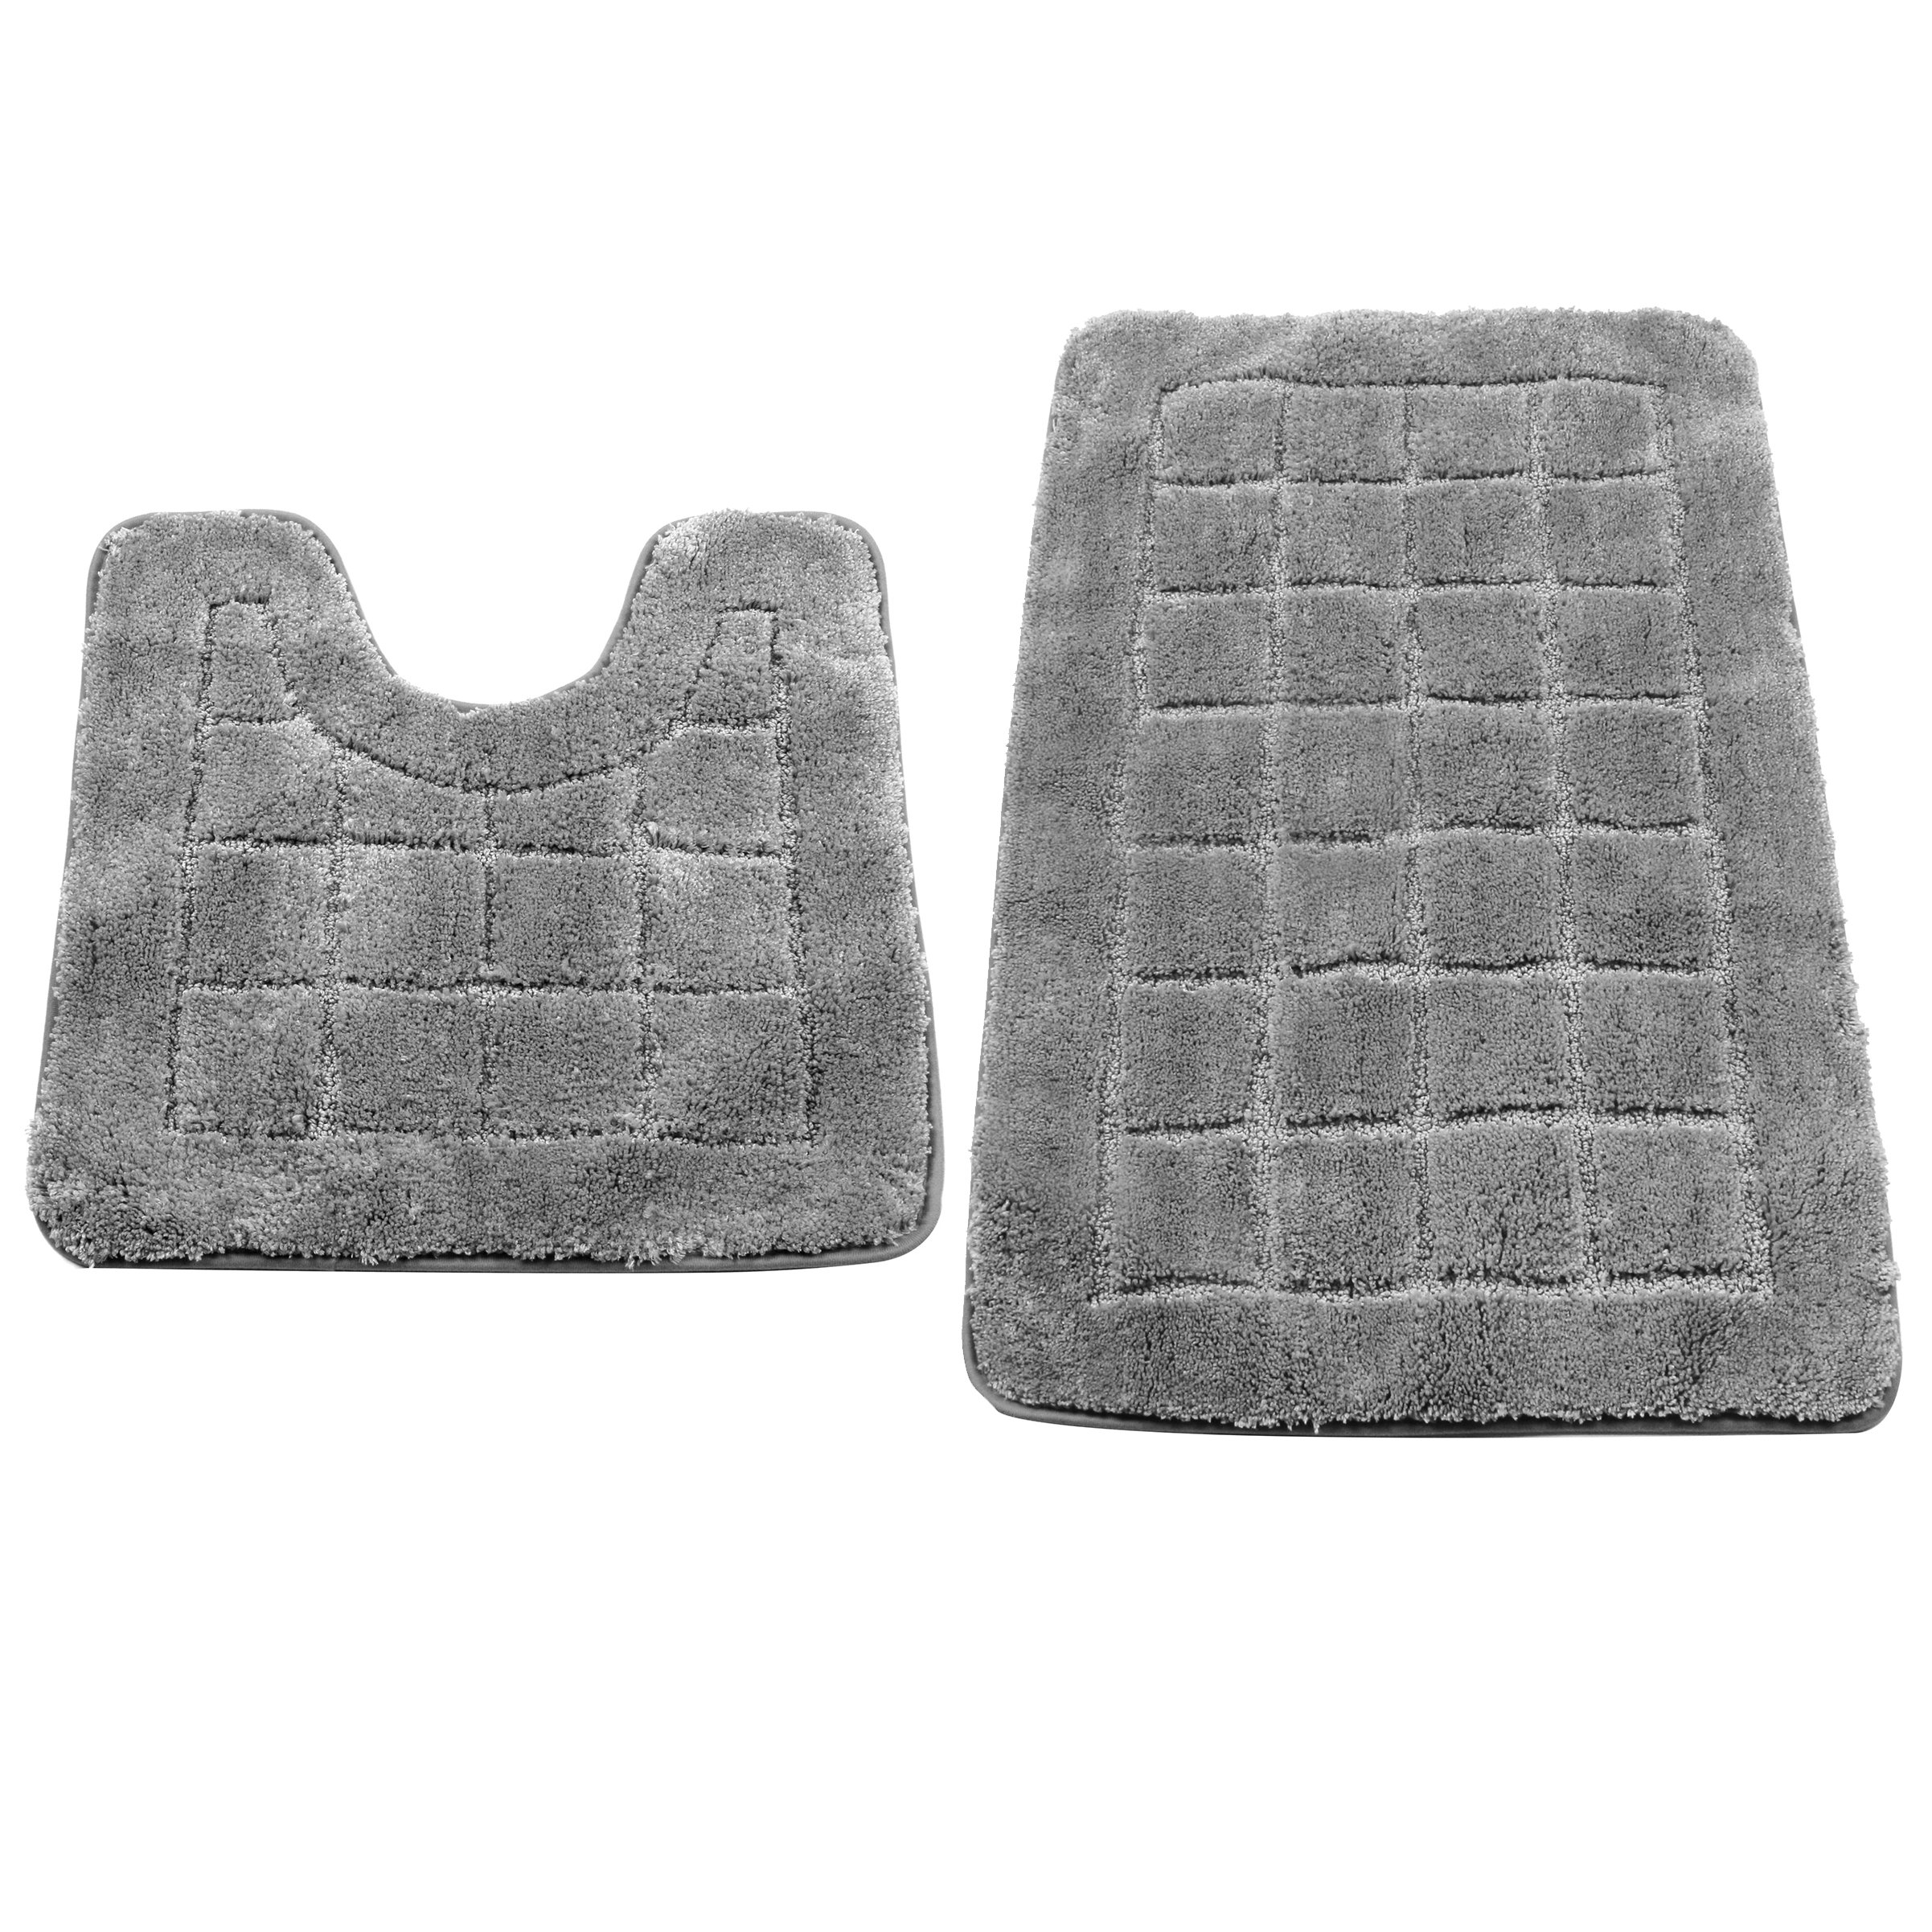 HEBE Bath Rugs Set of 2 Non Slip Microfiber Bathroom Contour Rug Combo Set Washable Bath Shower Mat with U-shaped Toilet Rug Absorbent(21x34+20x20, Grey)